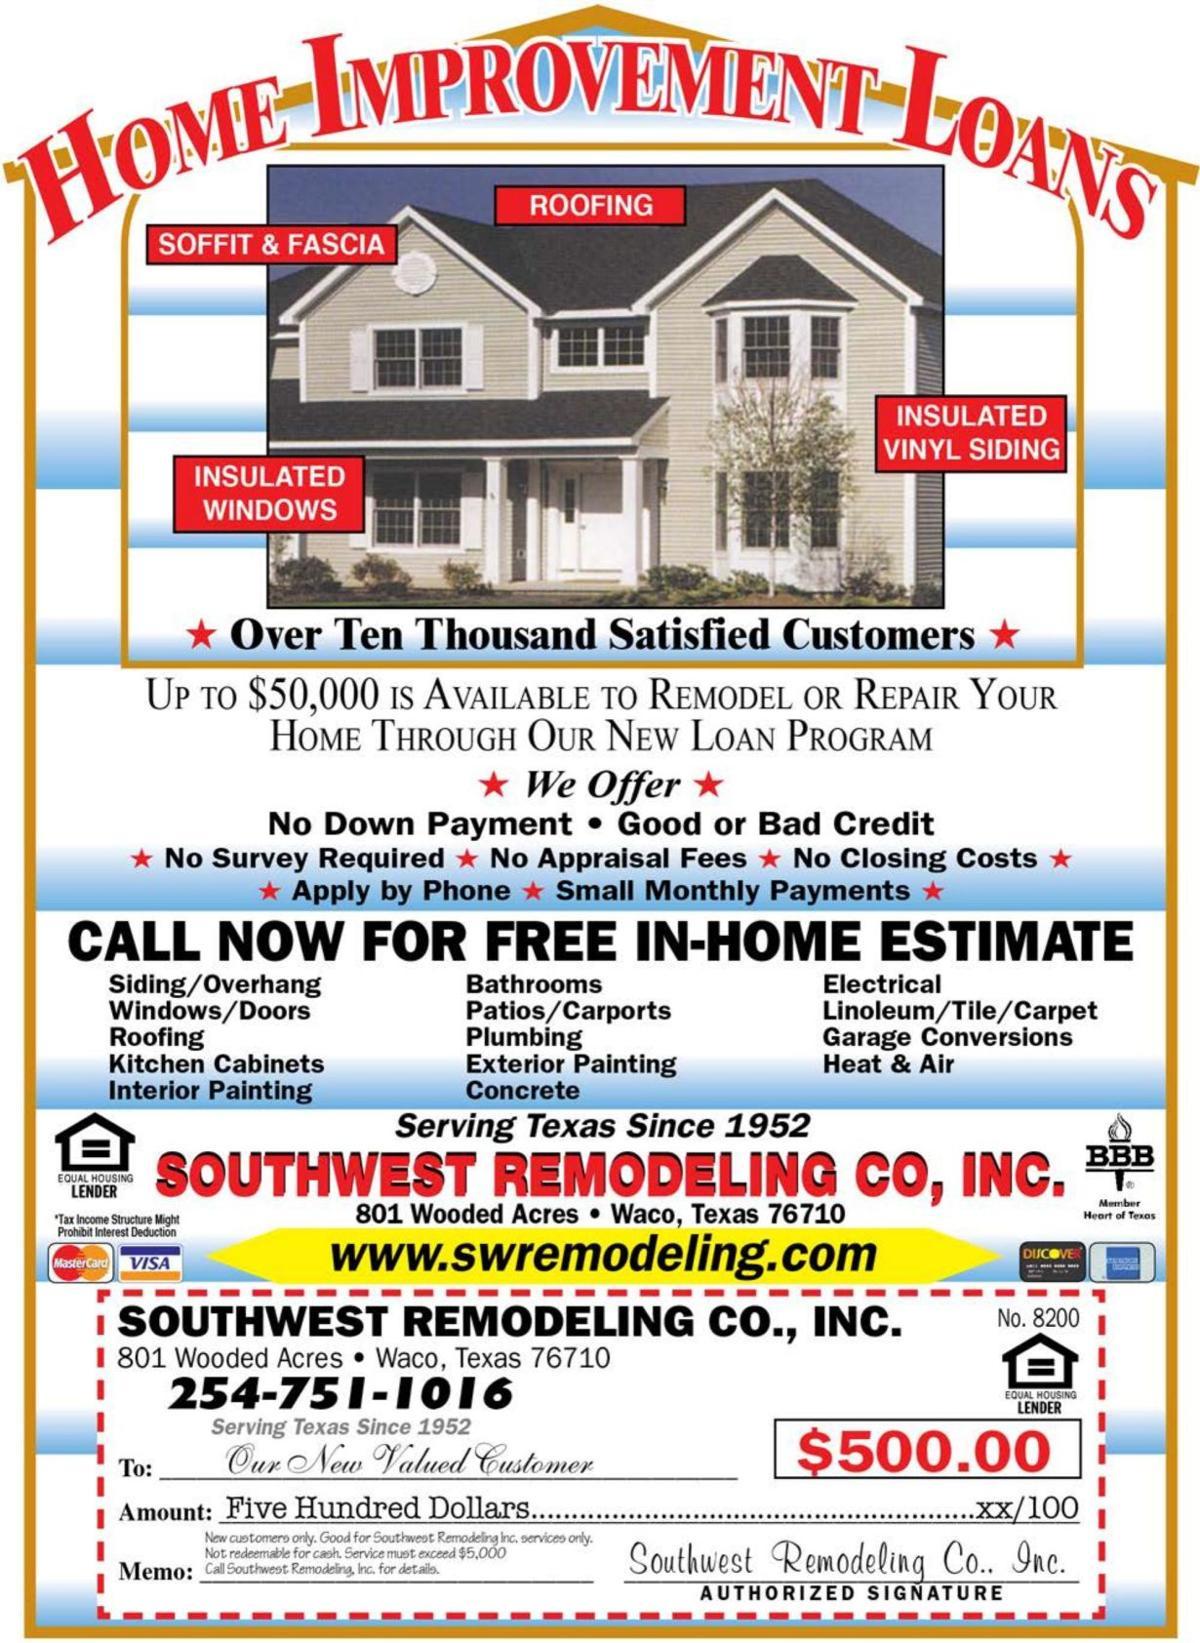 Southwest Remodeling - Home Improvement Loans